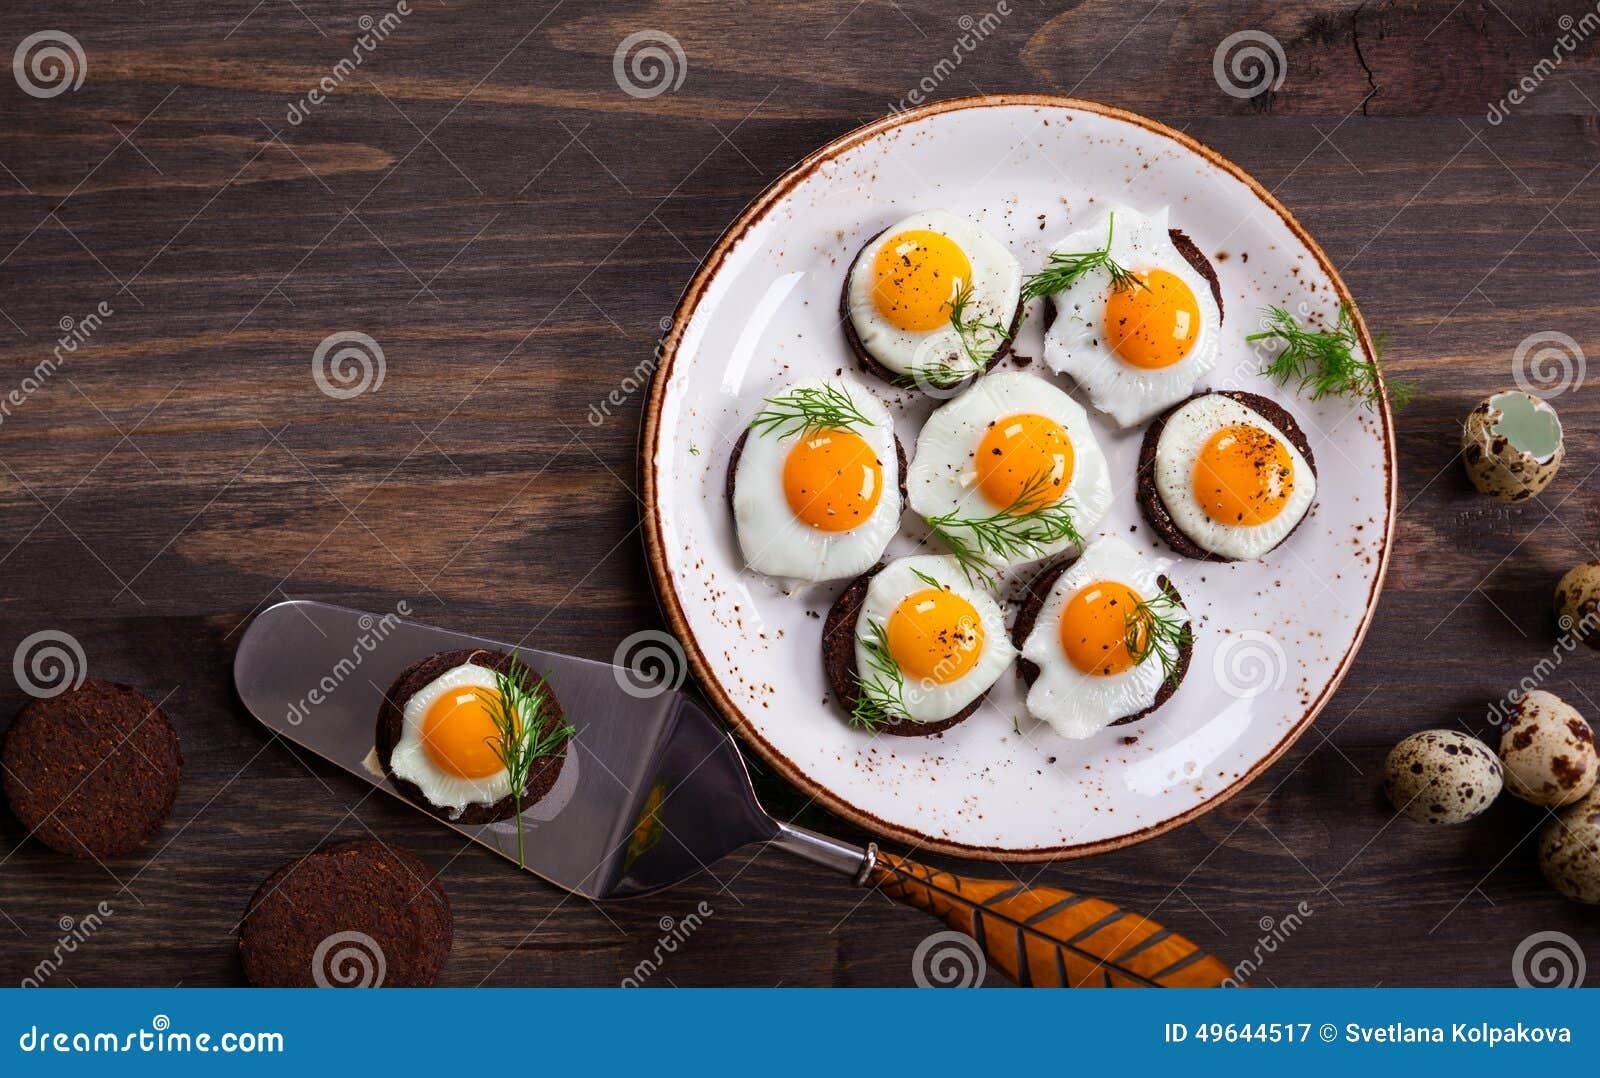 Quail egg canapes stock photo image 49644517 for Quail egg canape